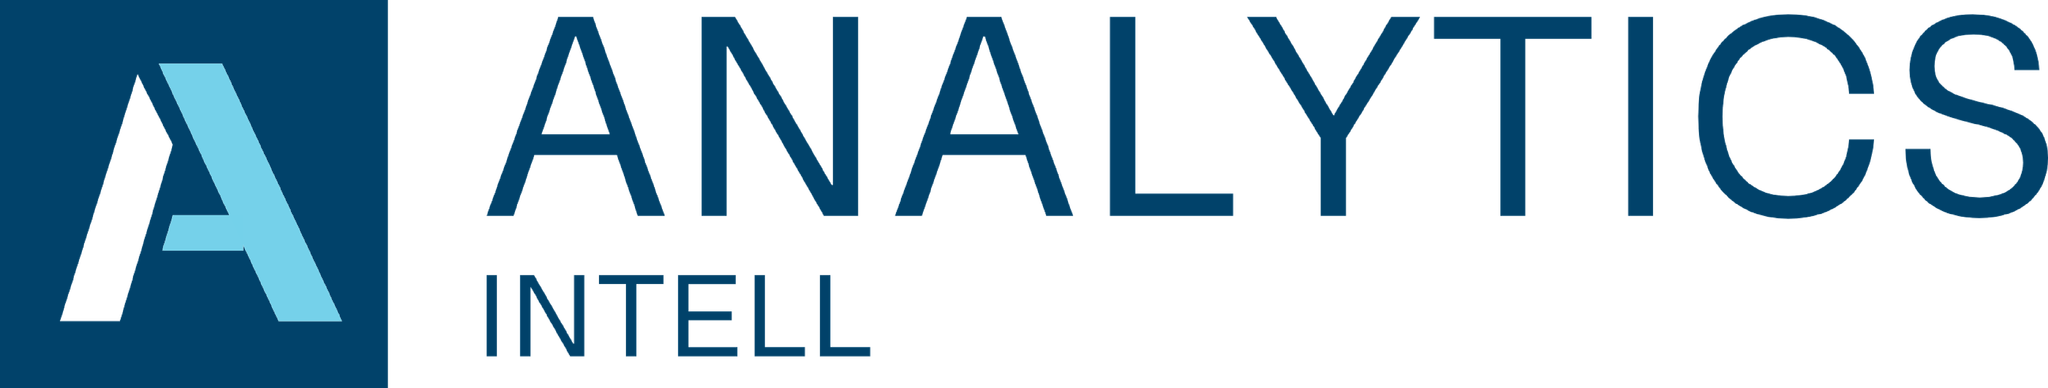 Analytics Intell